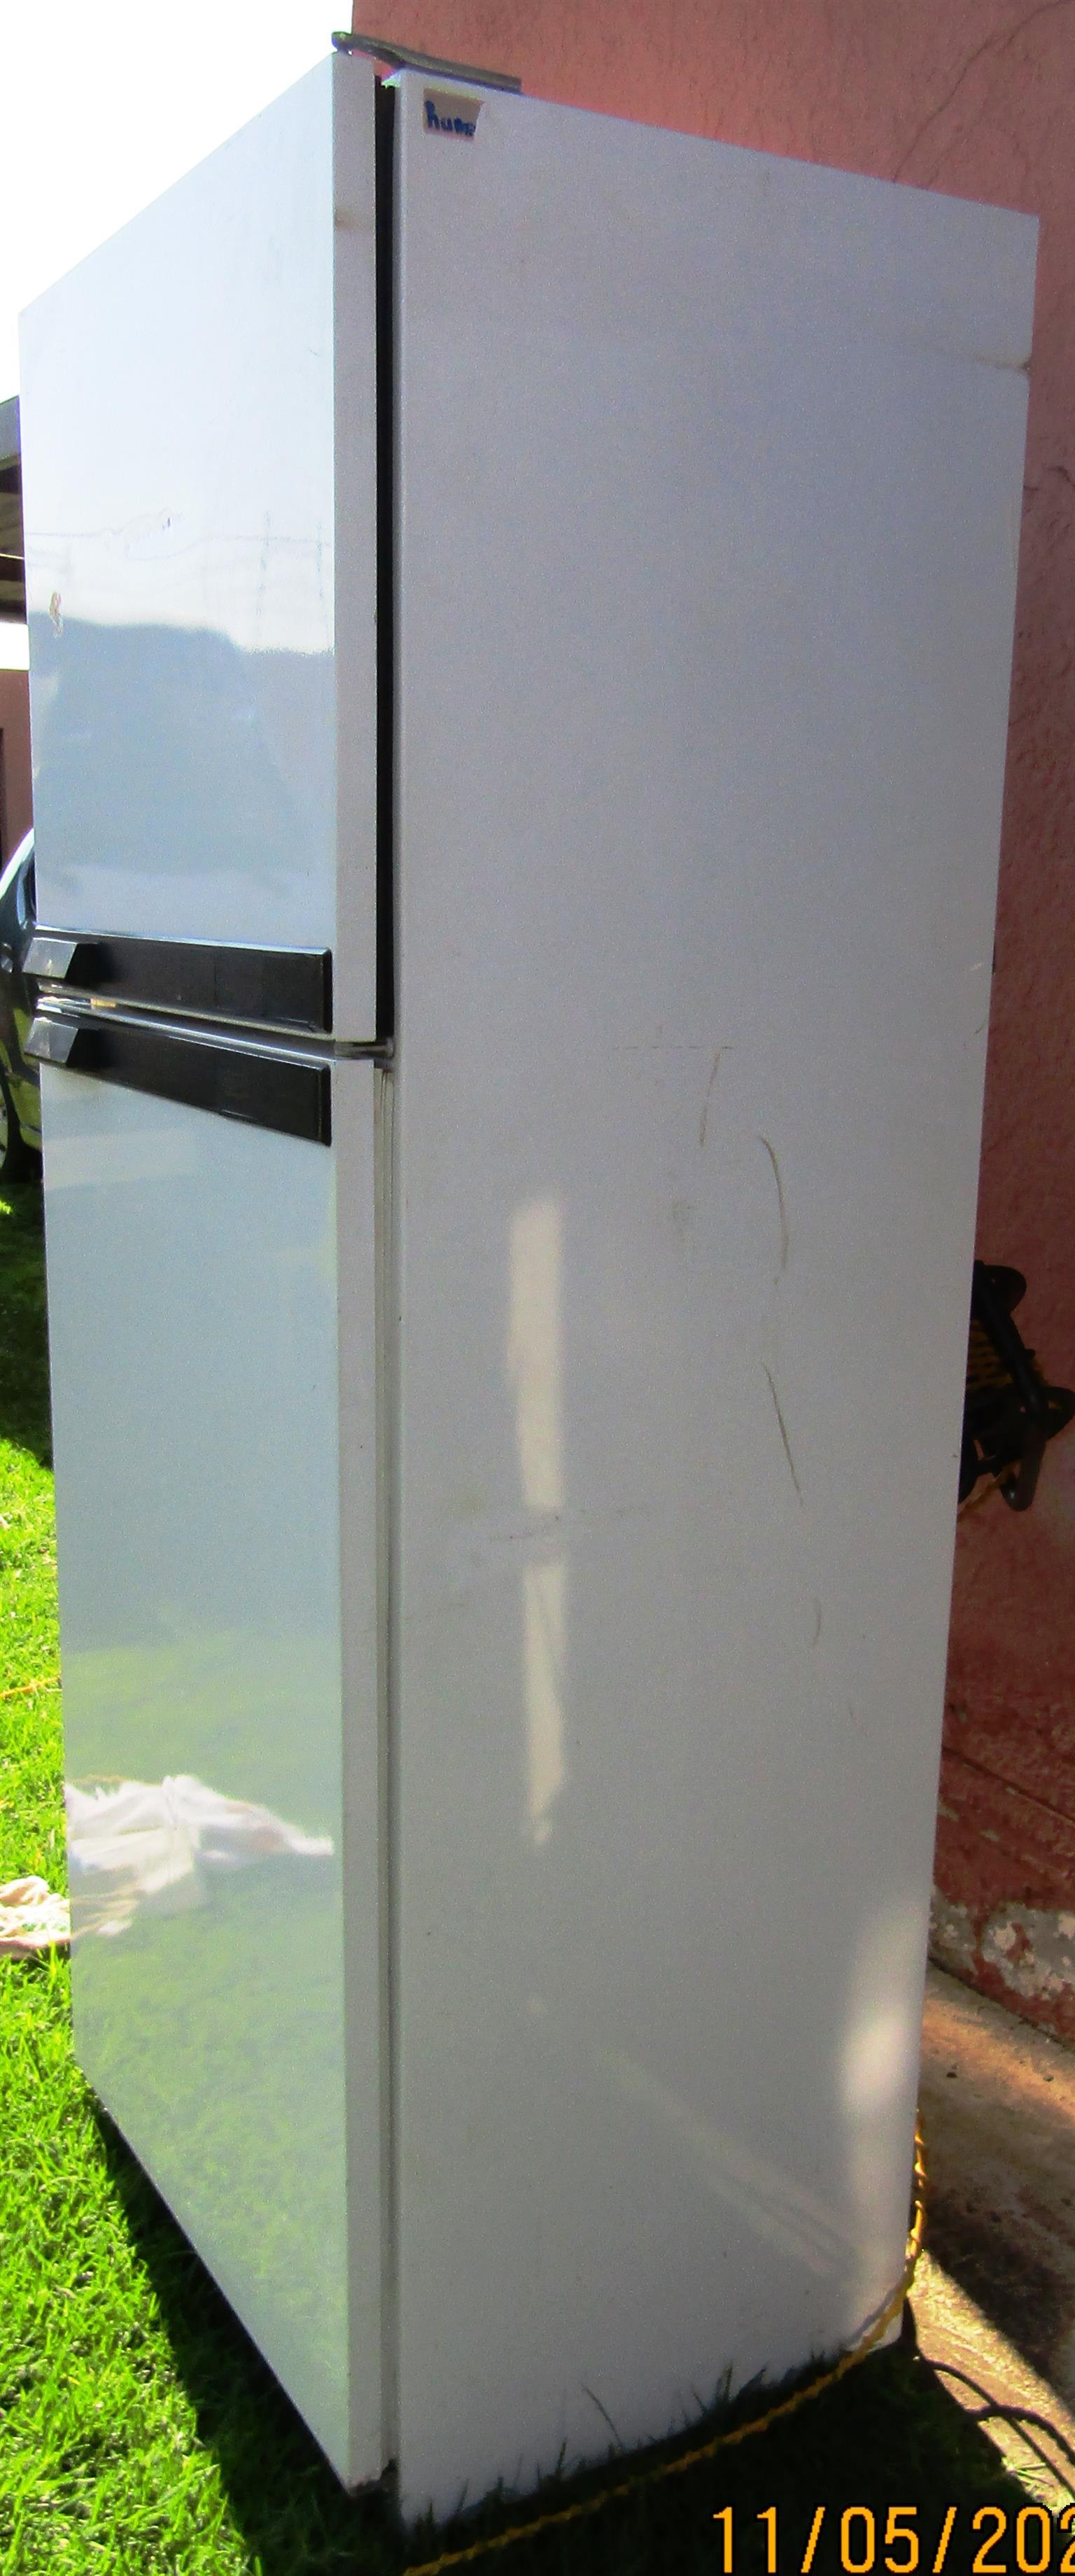 Defy DD430 Fridge/Freezer